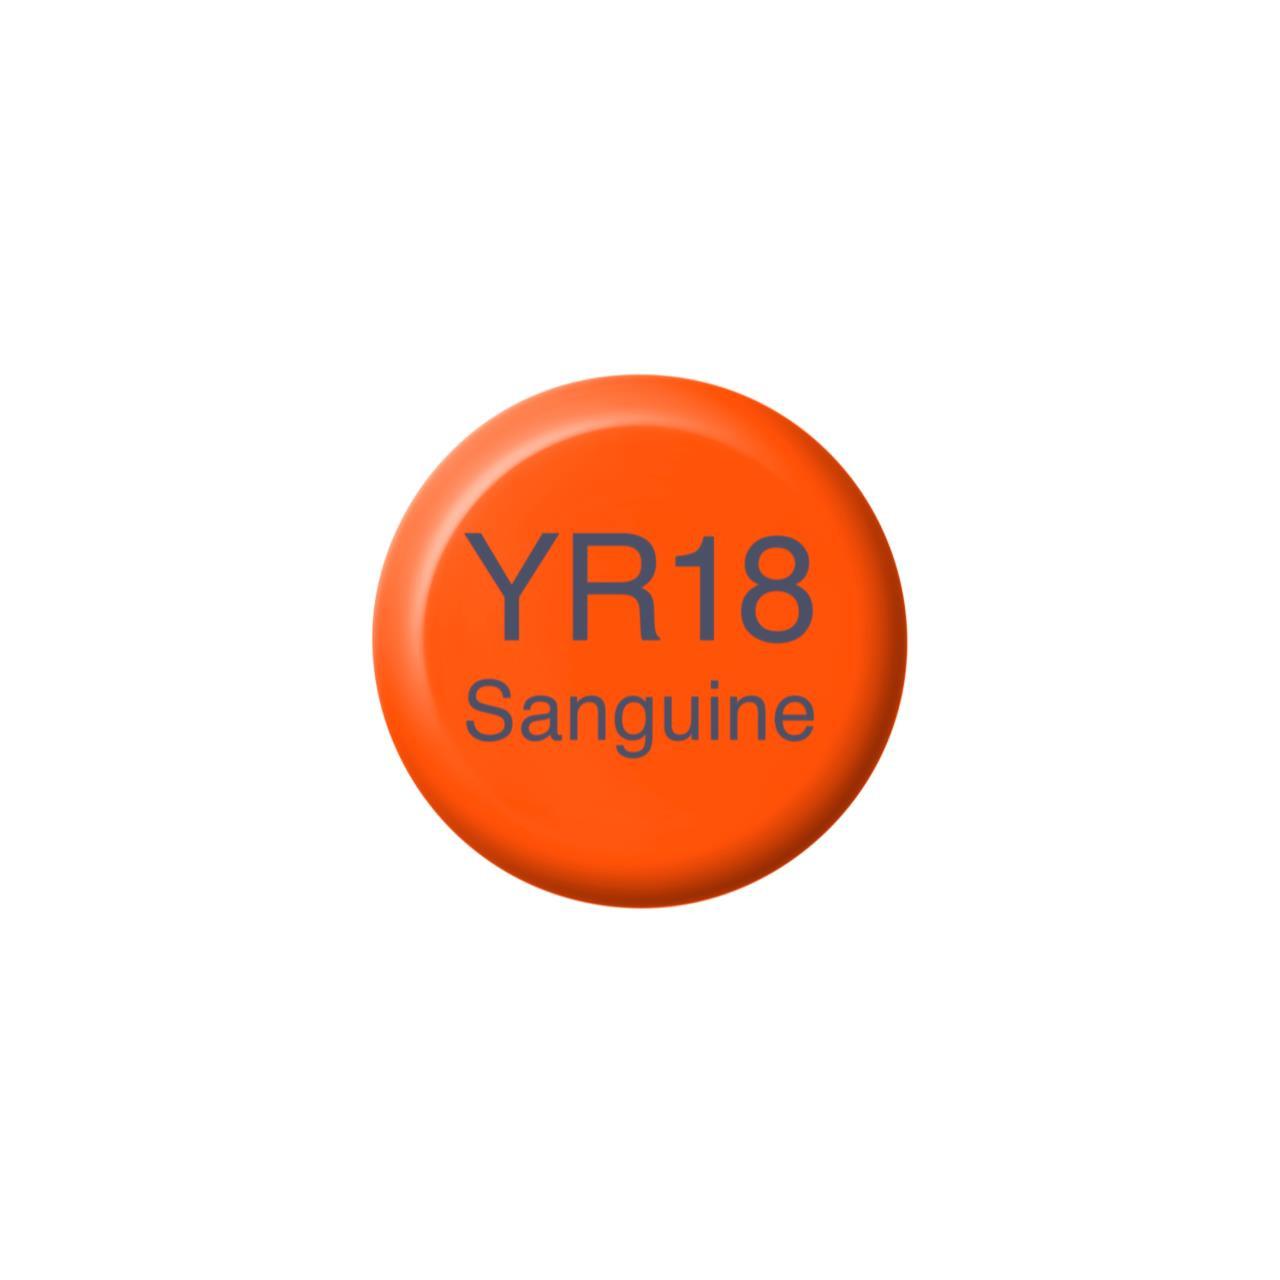 YR18 Sanguine, Copic Ink - 4511338058695